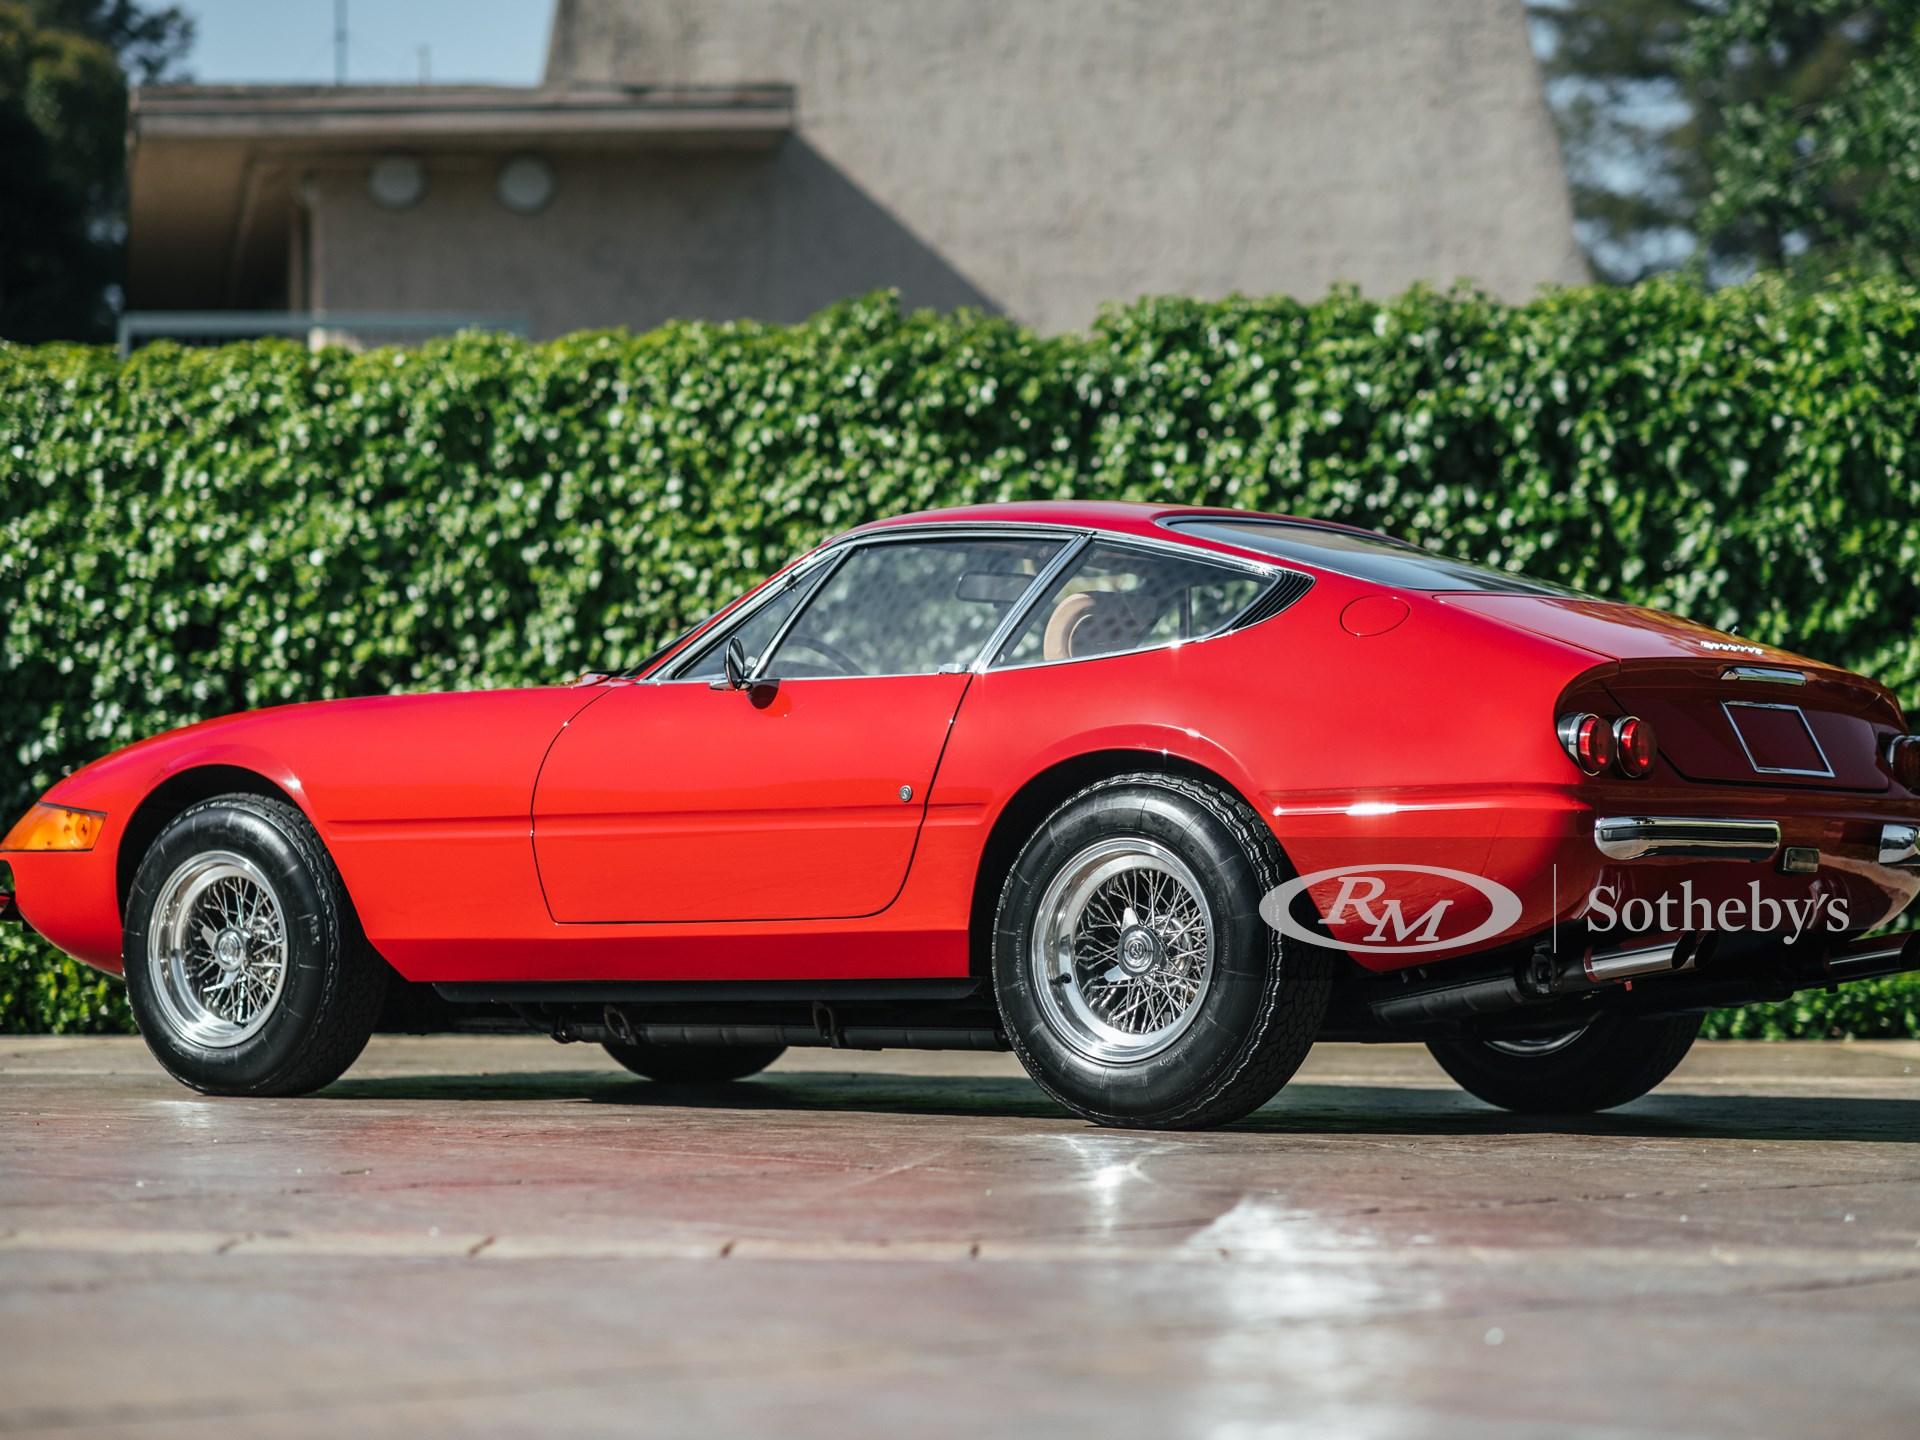 210427 RM Sotheby's Amelia Island Auction - 1972 Ferrari 365 GTB 4 Daytona Berlinetta